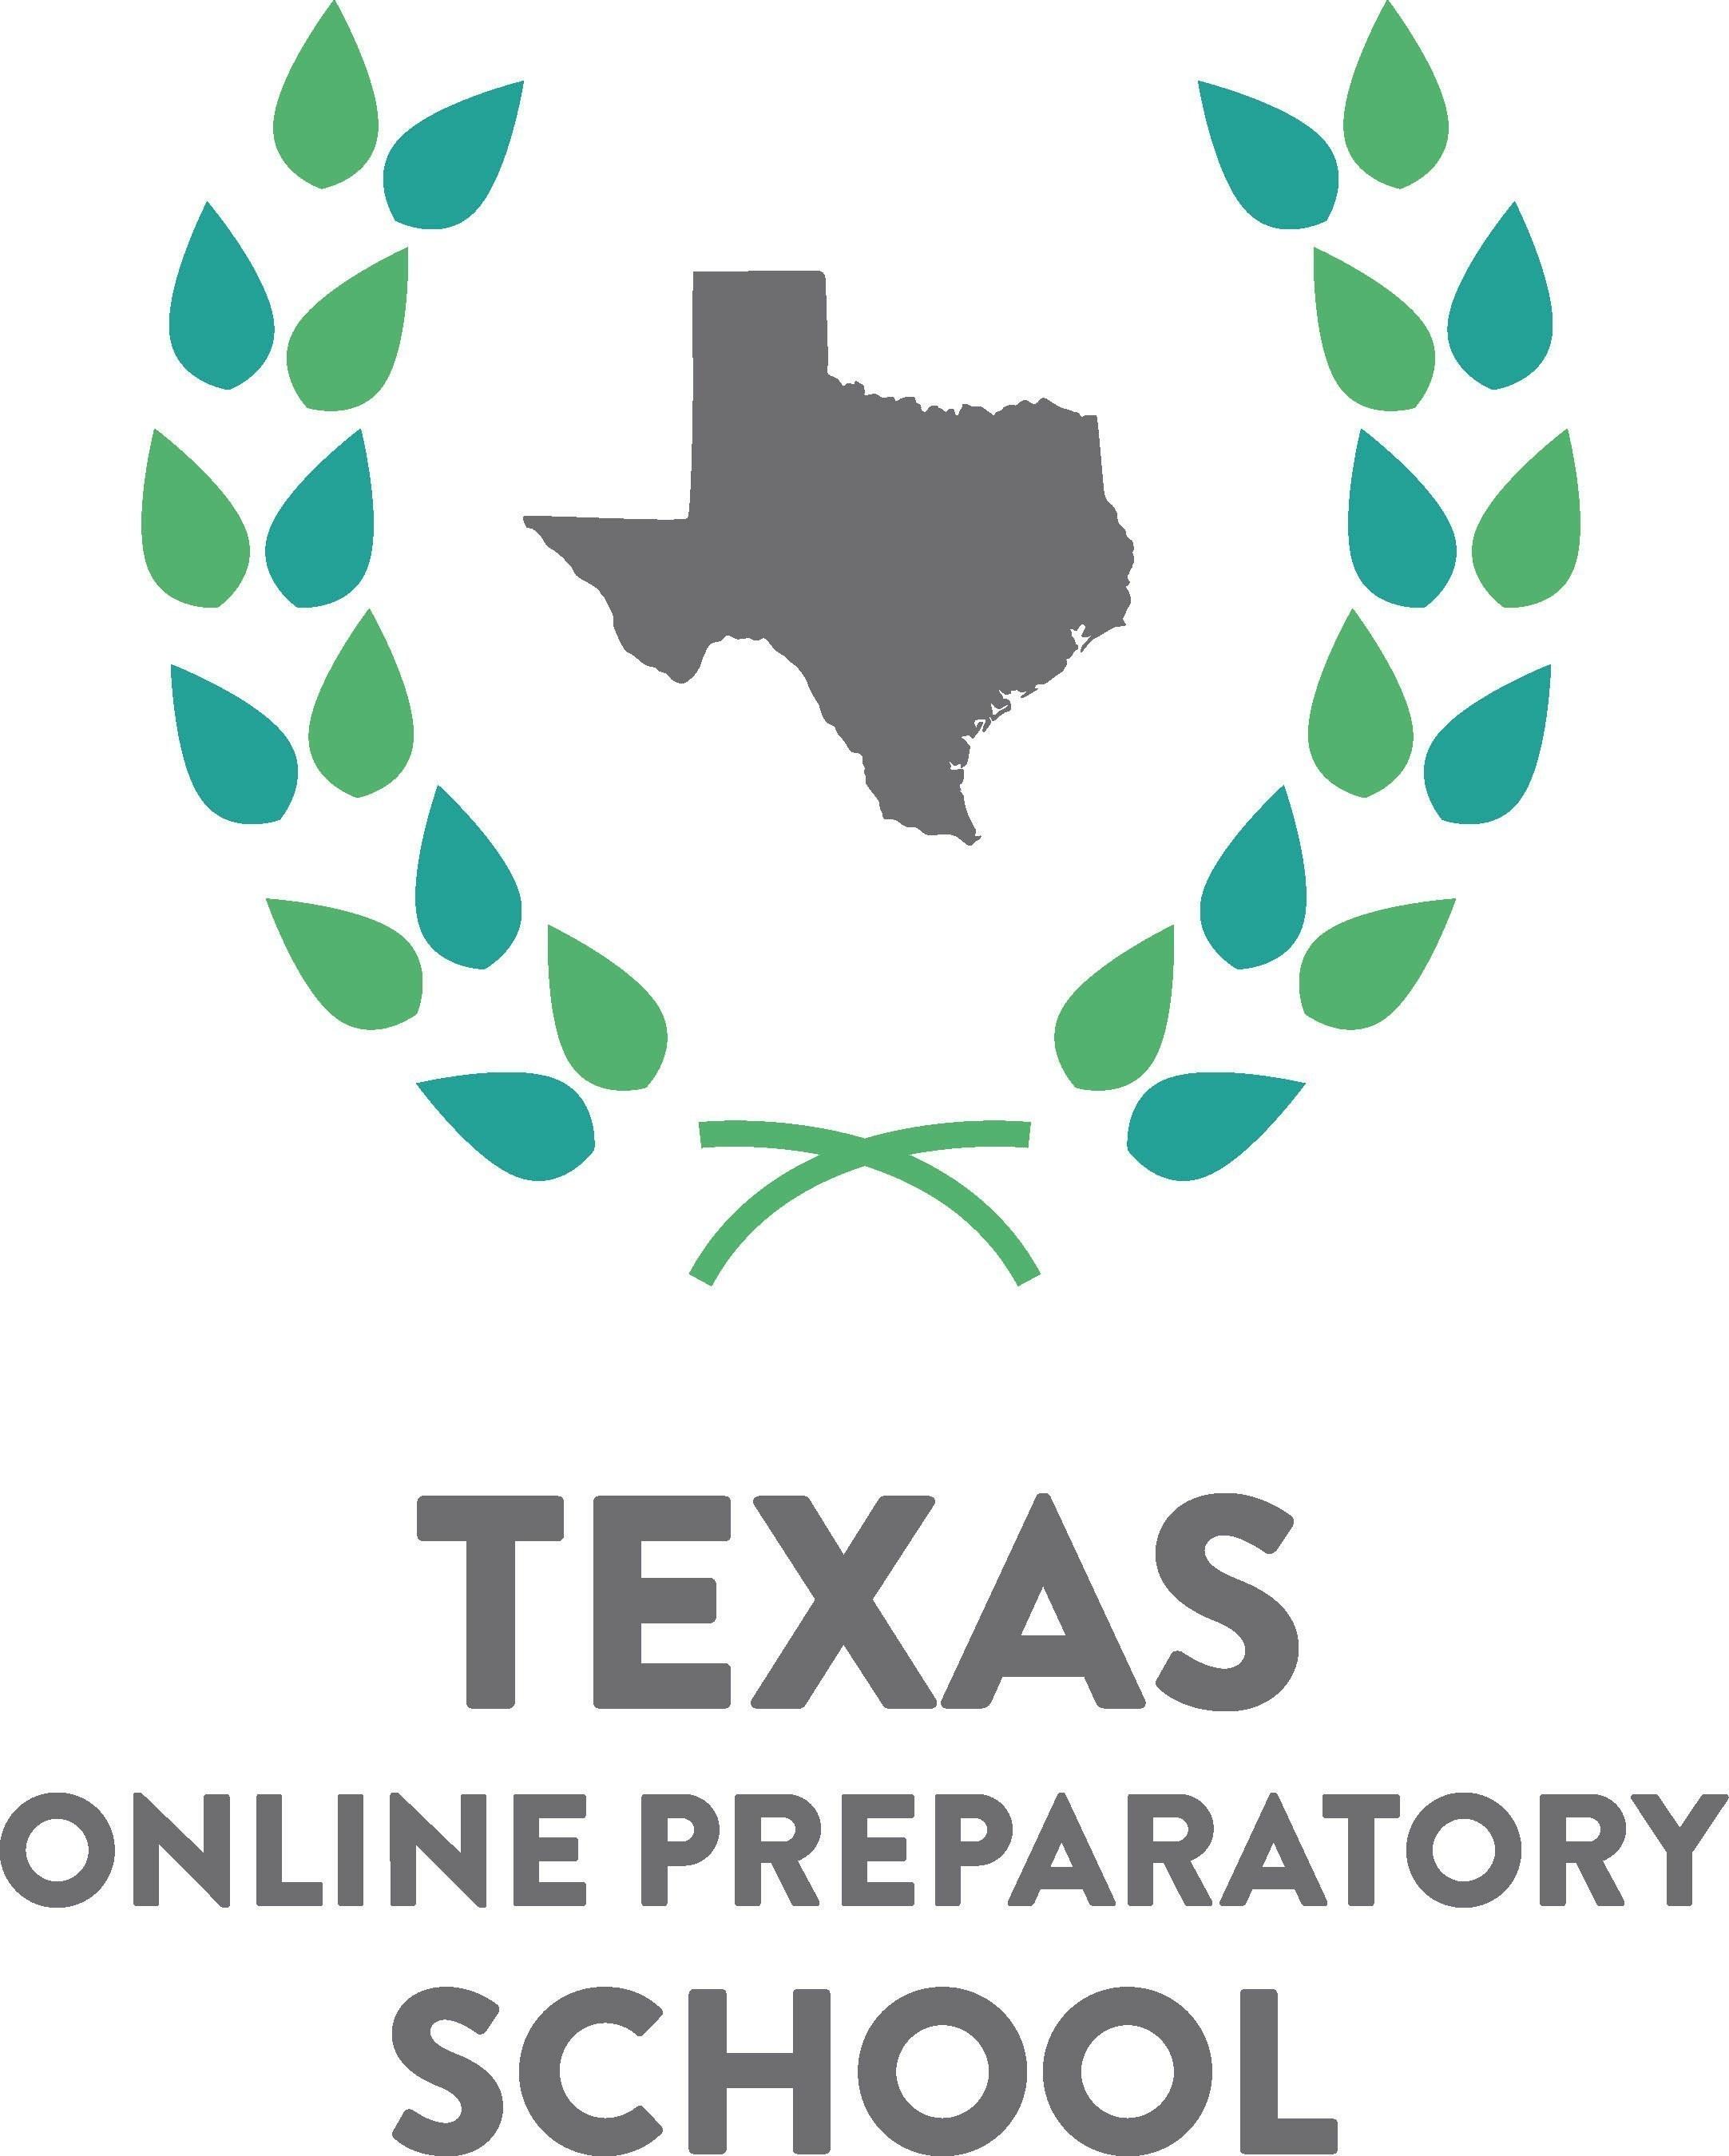 Texas Online Preparatory School